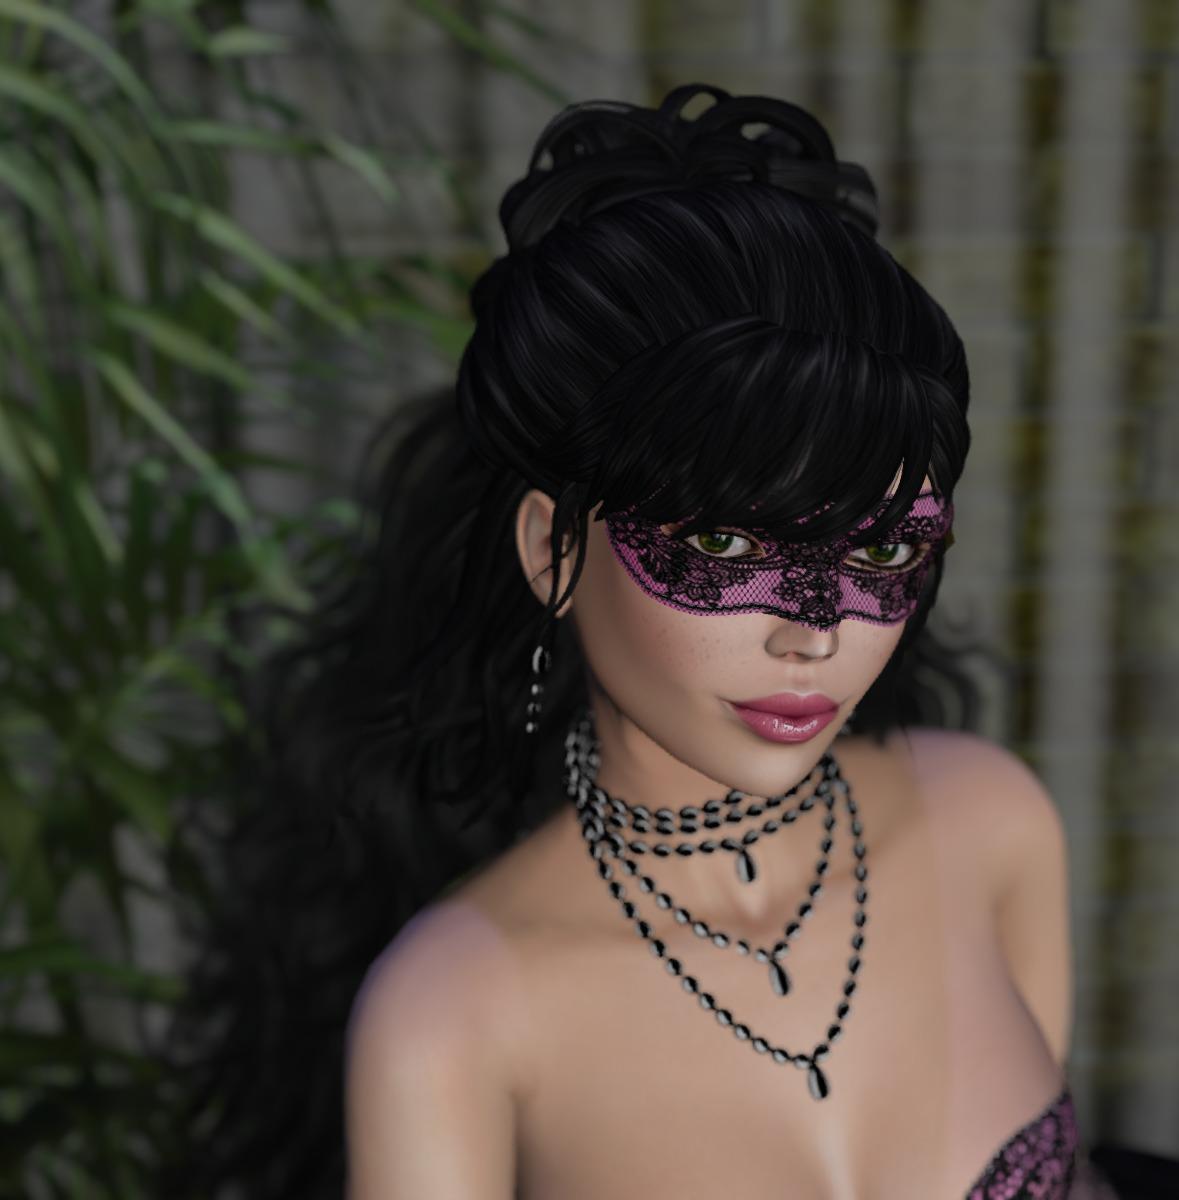 Abigail_c011